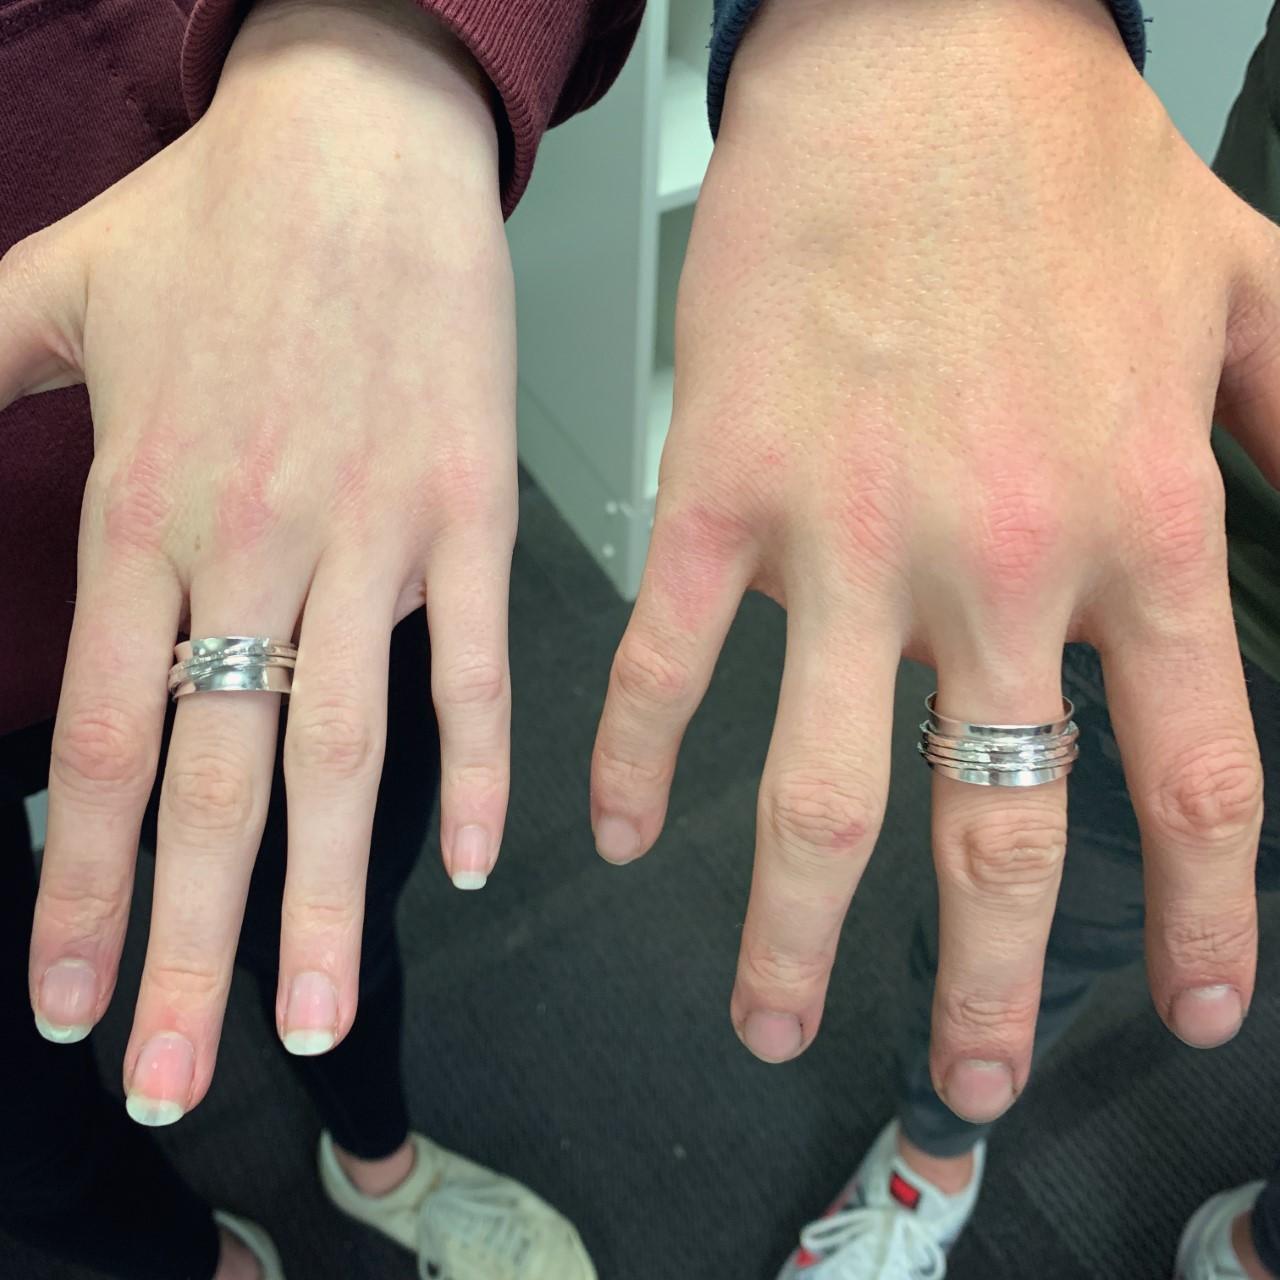 Silver spinning ring making